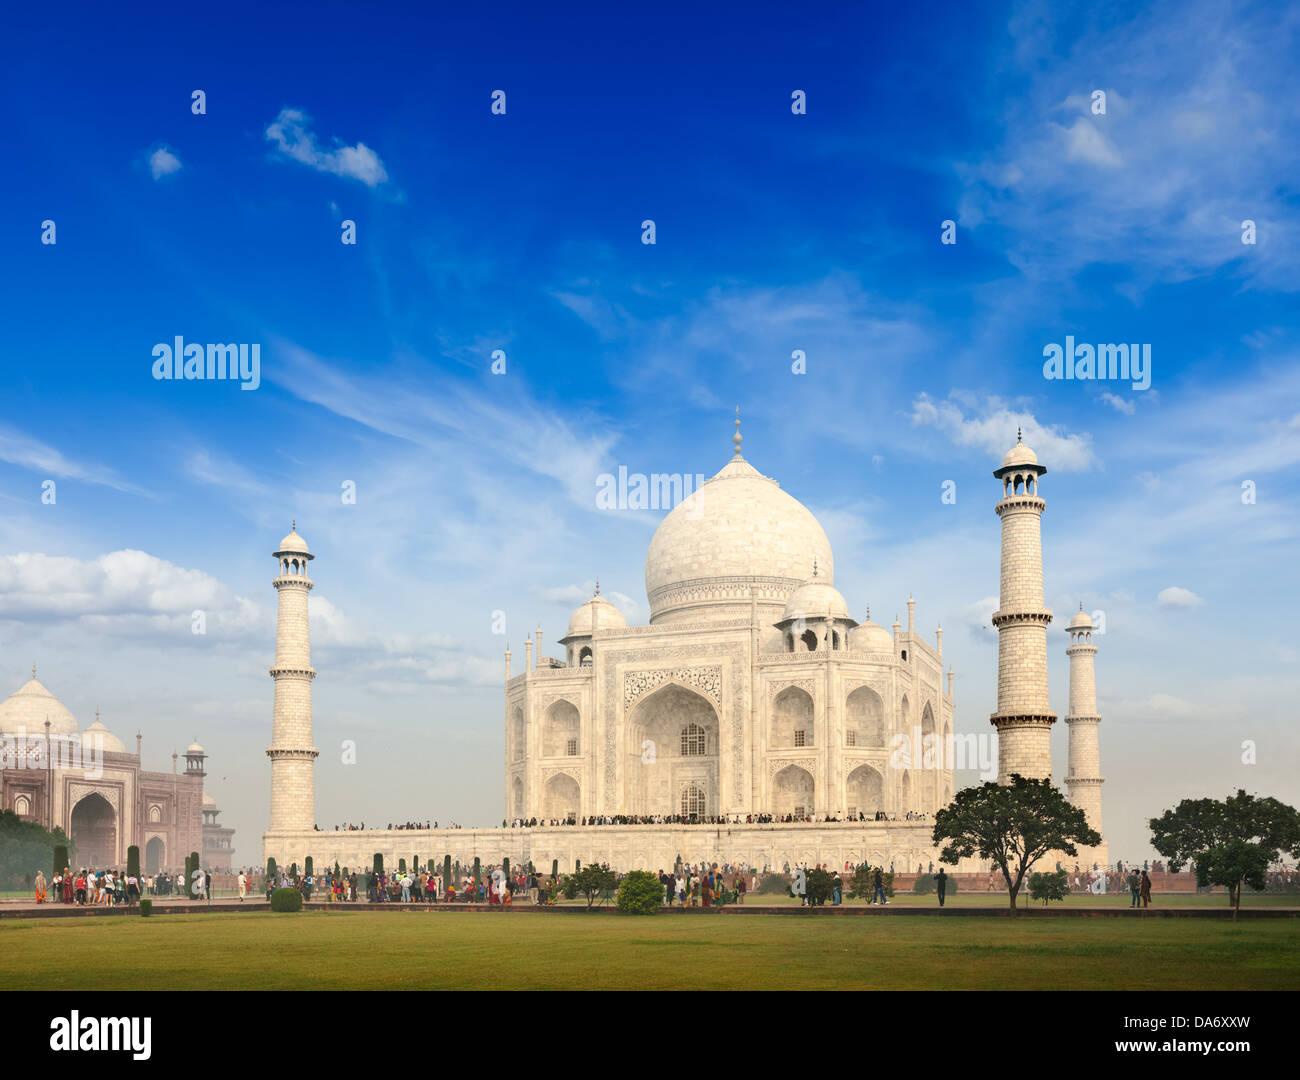 Taj Mahal. Symbole indien - Inde billet d'arrière-plan. Agra, Inde Photo Stock